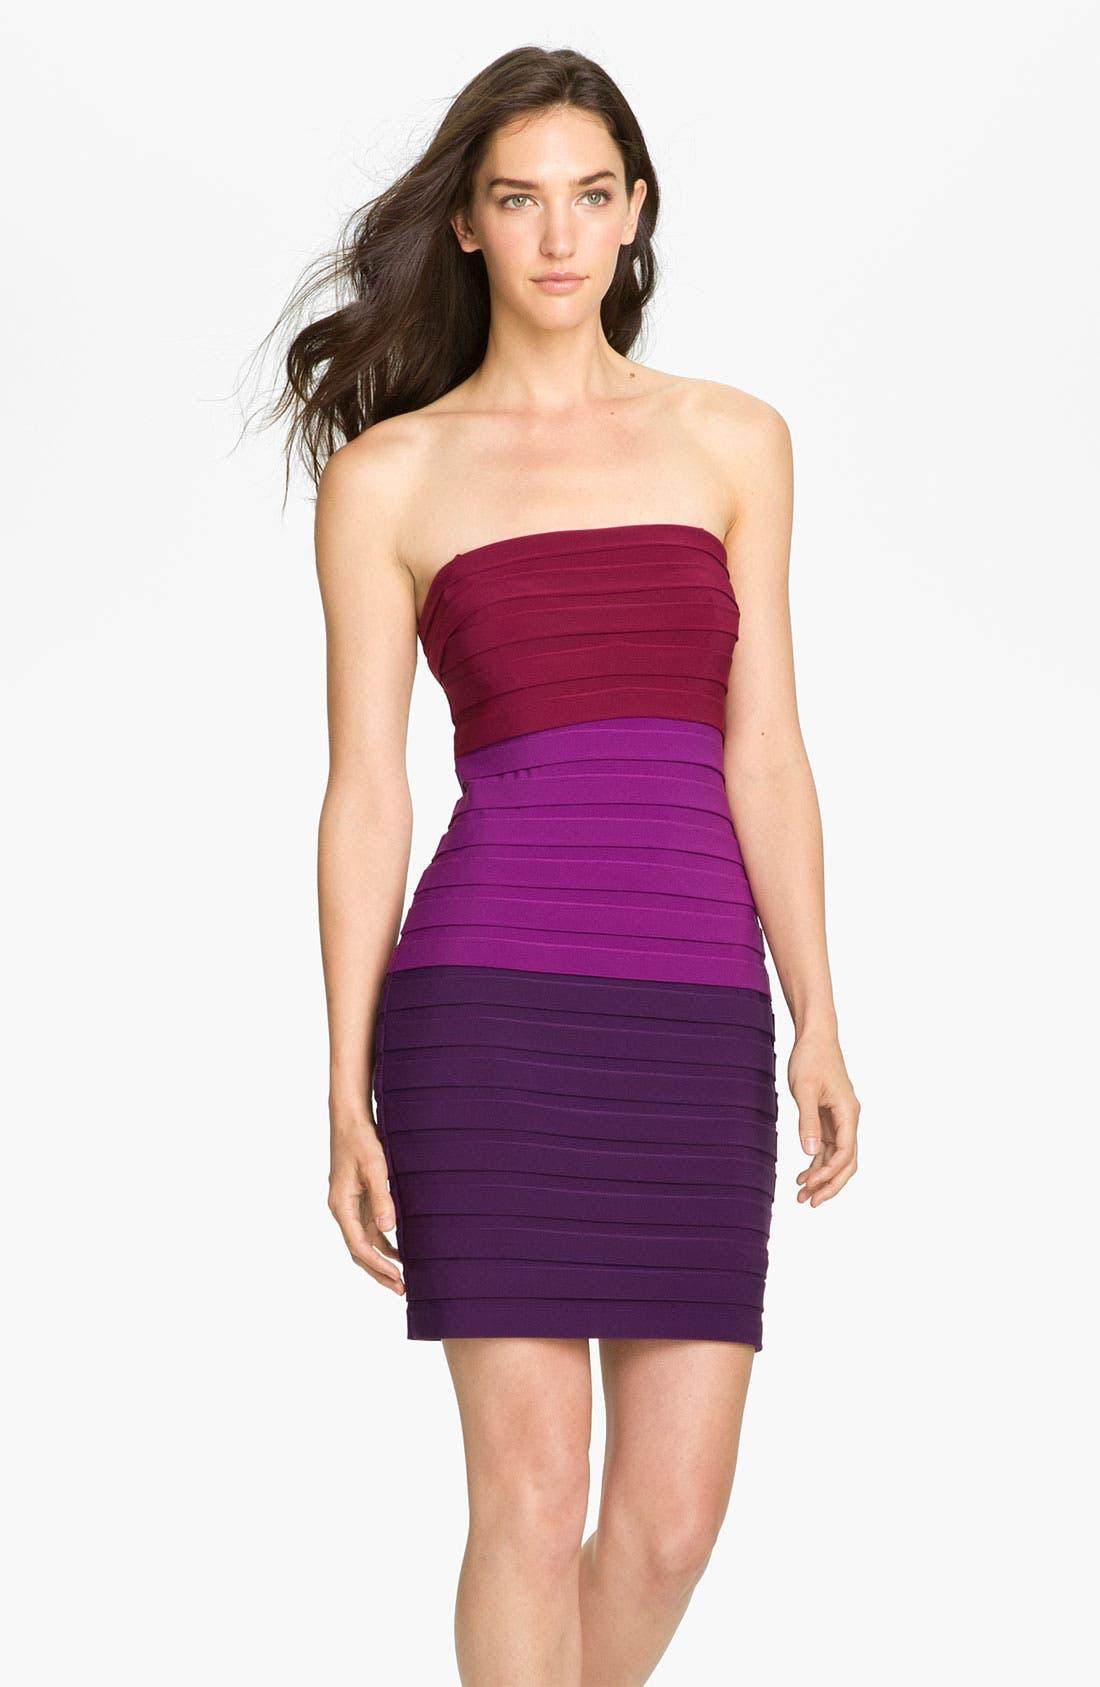 Alternate Image 1 Selected - Max & Cleo 'Suzy' Strapless Shutter Pleat Jersey Sheath Dress